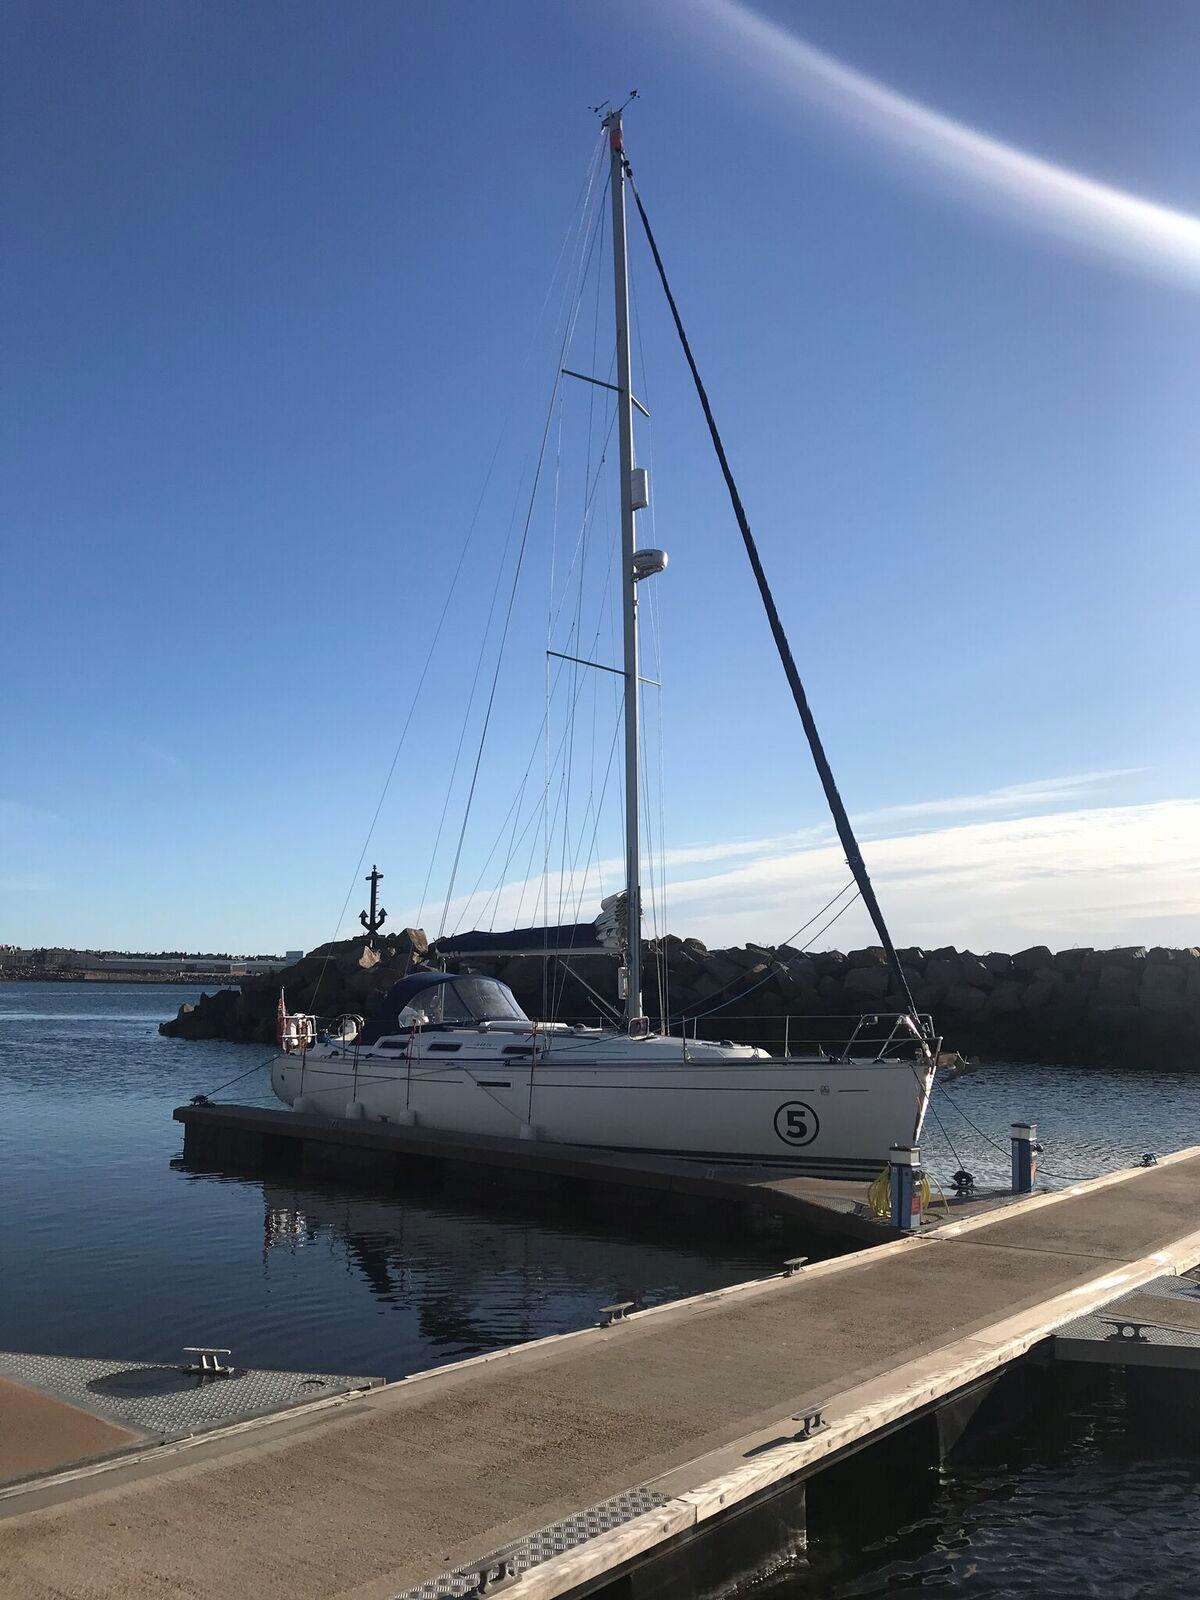 ROUND BRITAIN 2018: Levington to Inverness Passage